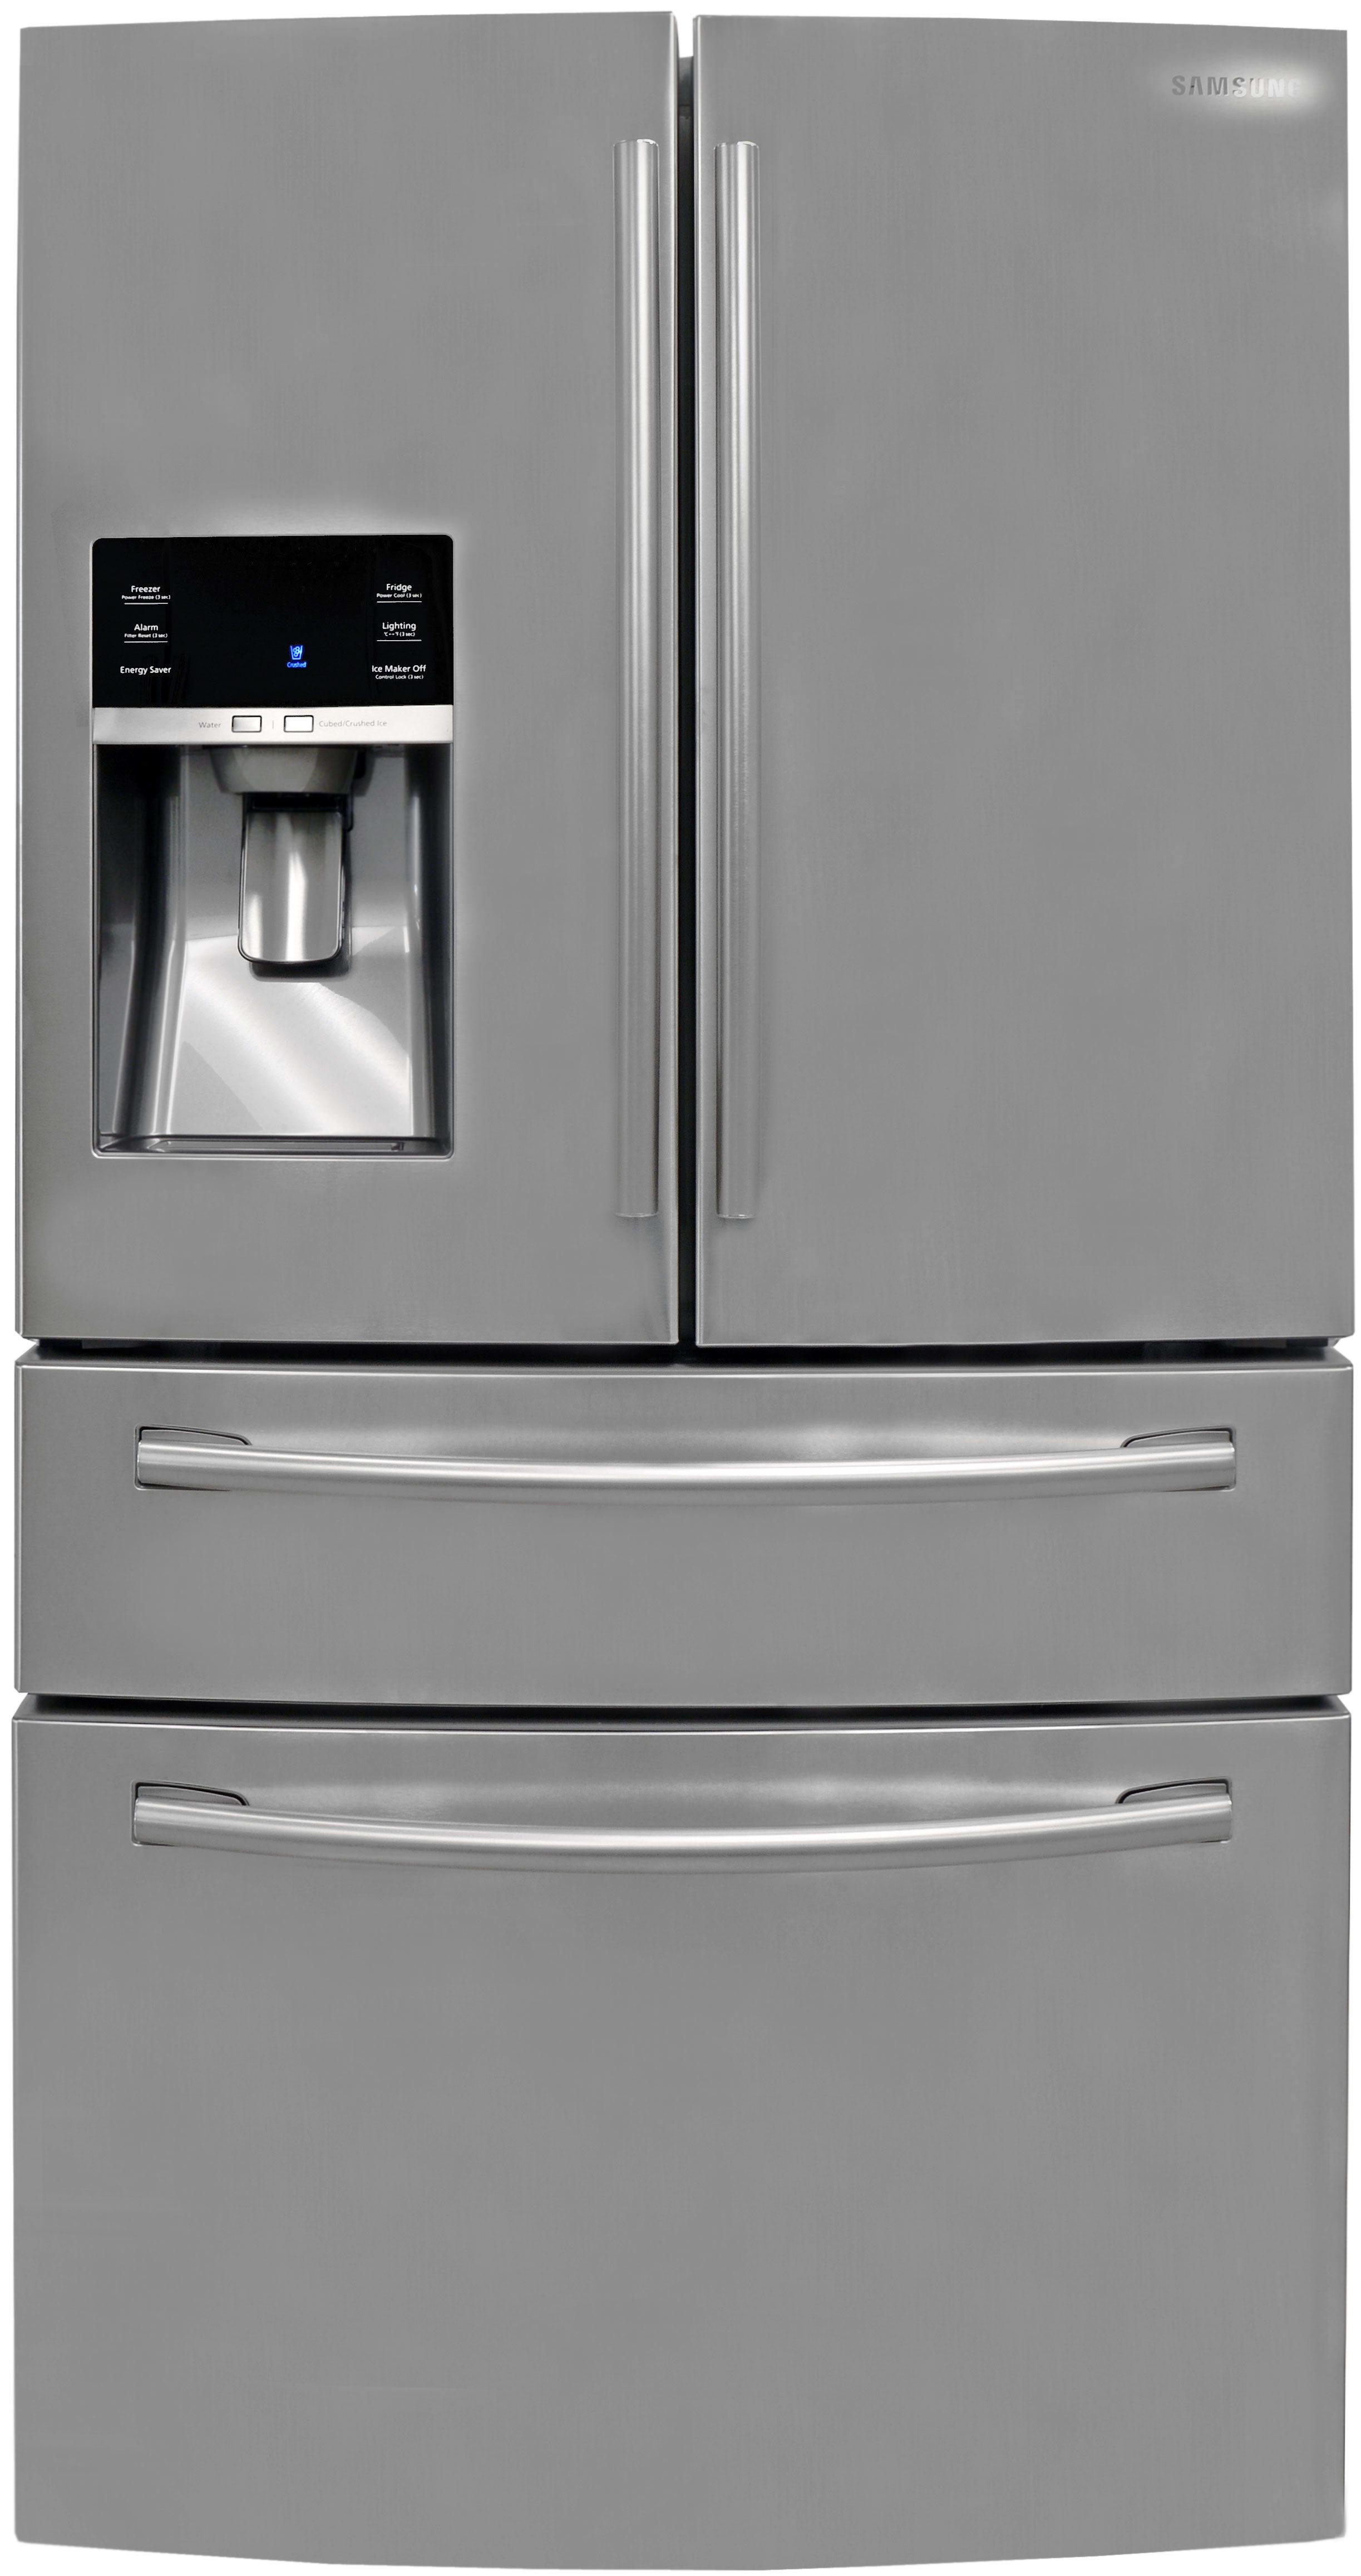 Samsung Refrigerator With Ice Maker In The Door